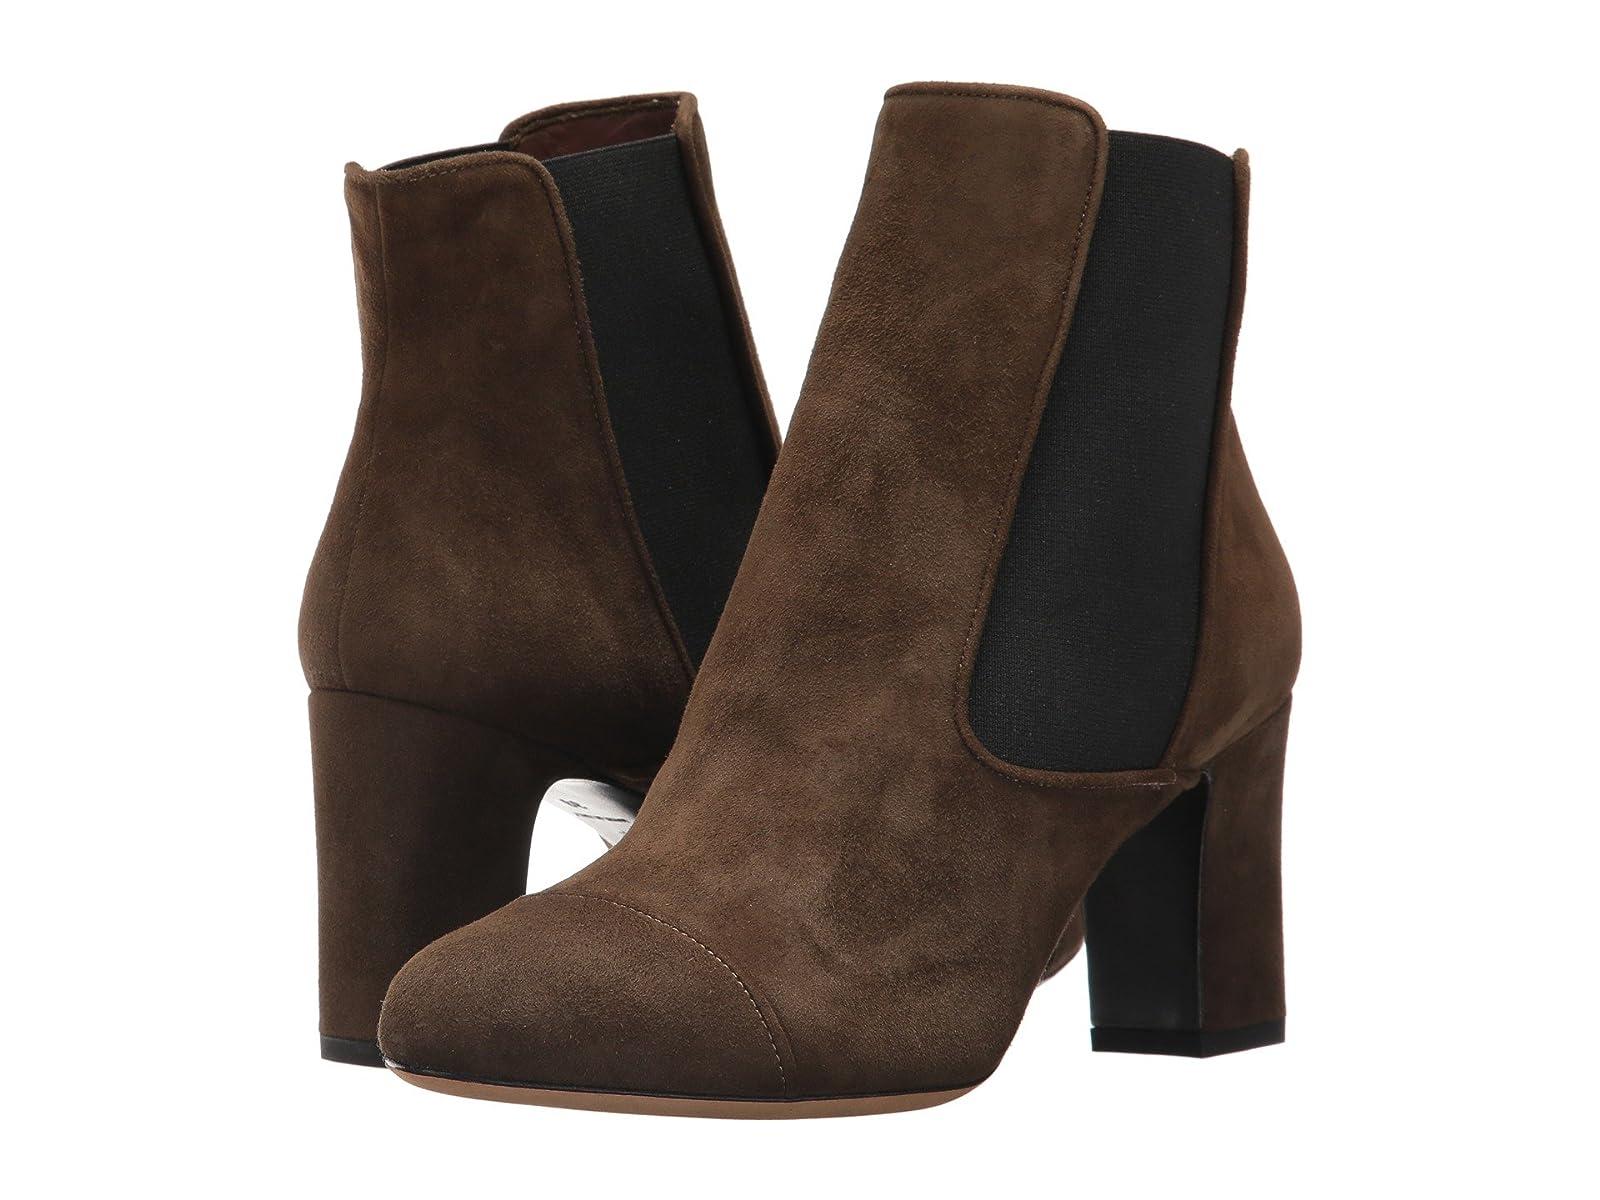 Tabitha Simmons KikiEconomical and quality shoes